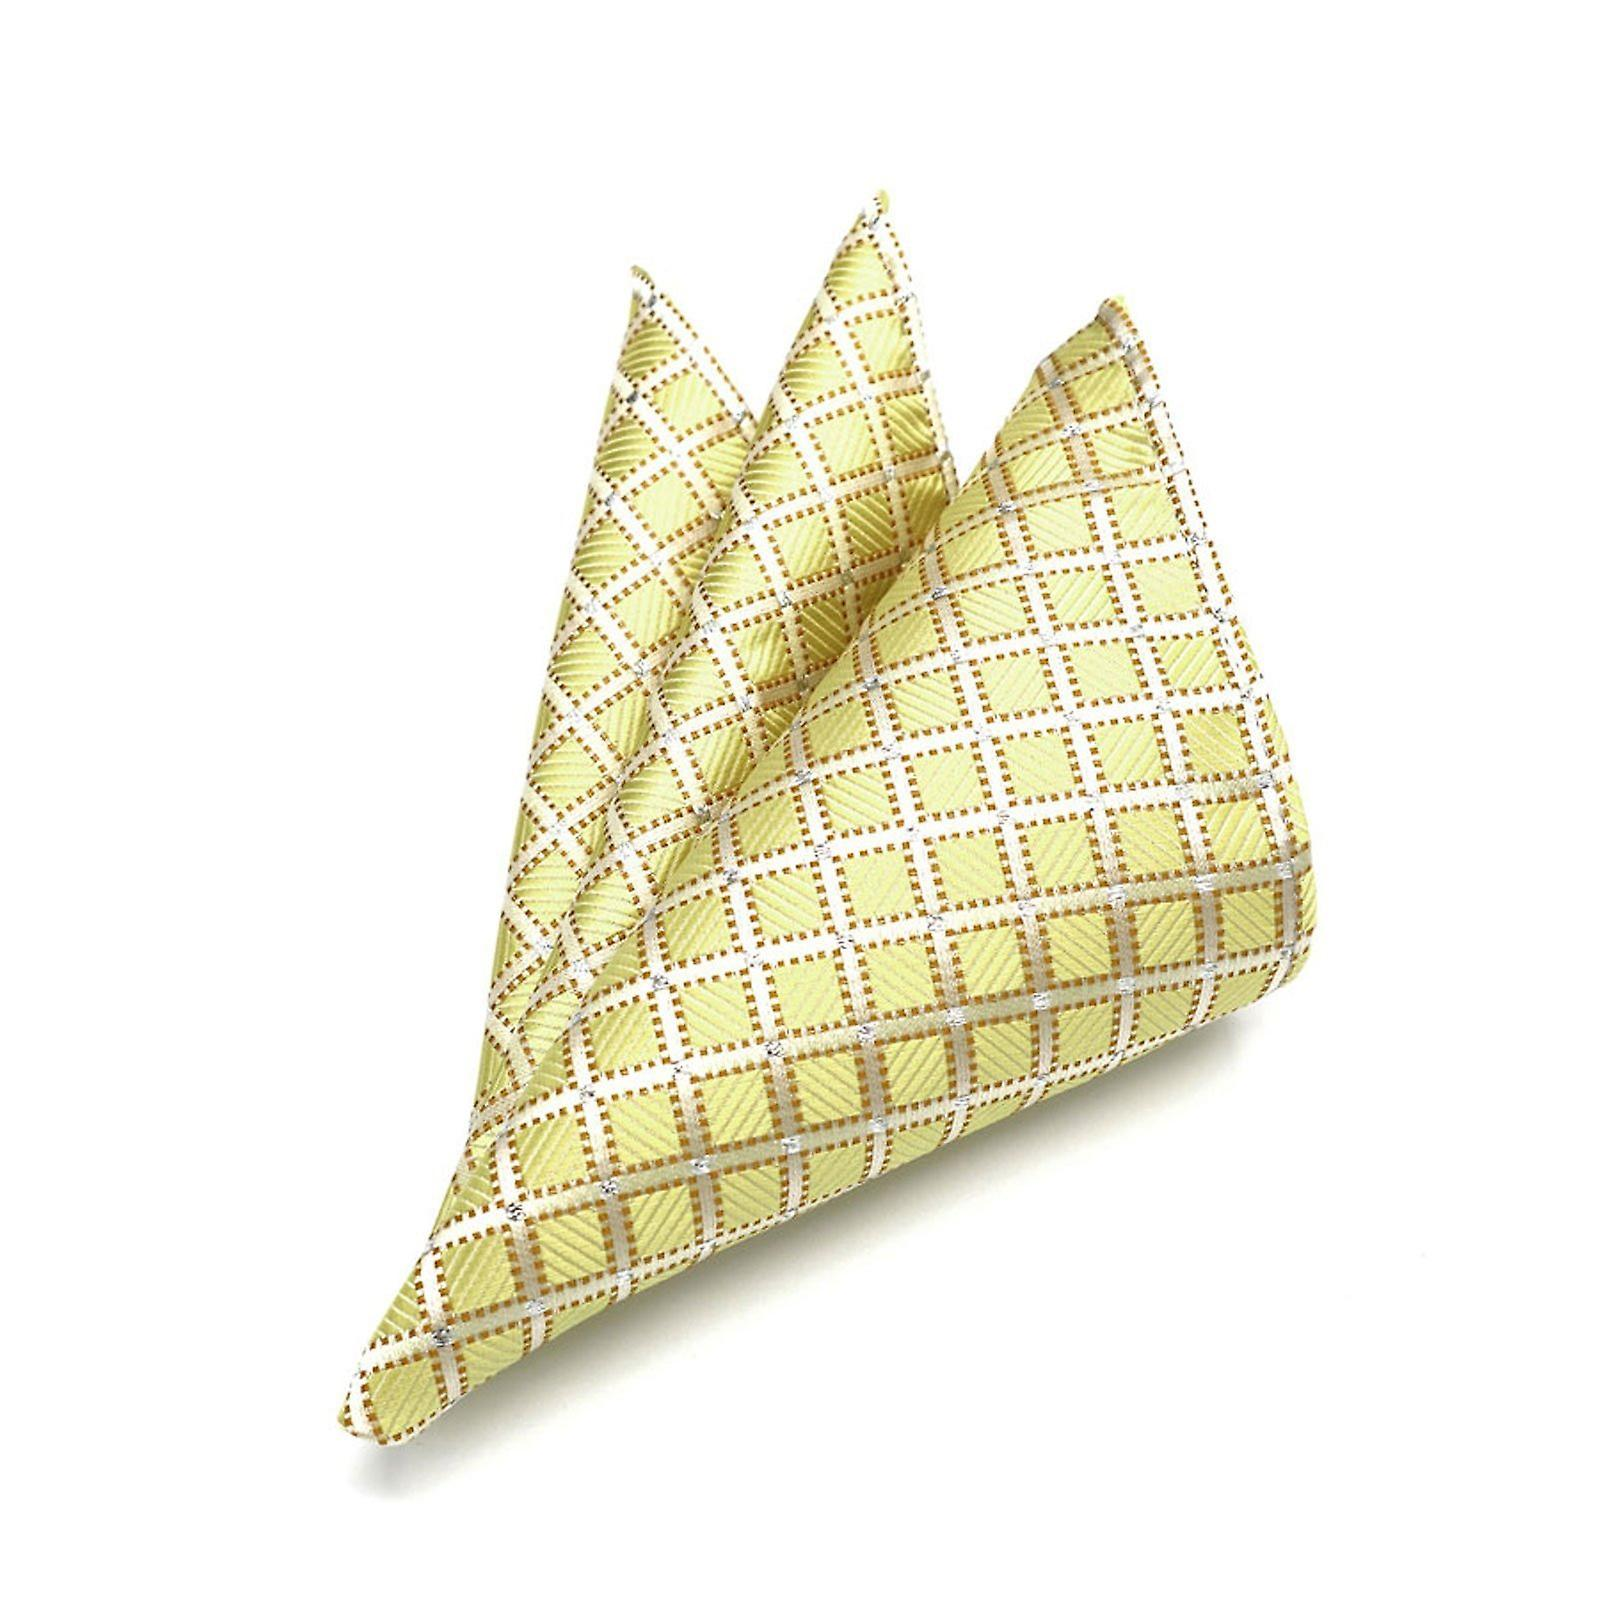 Indian wedding gold & silver patterned pocket square